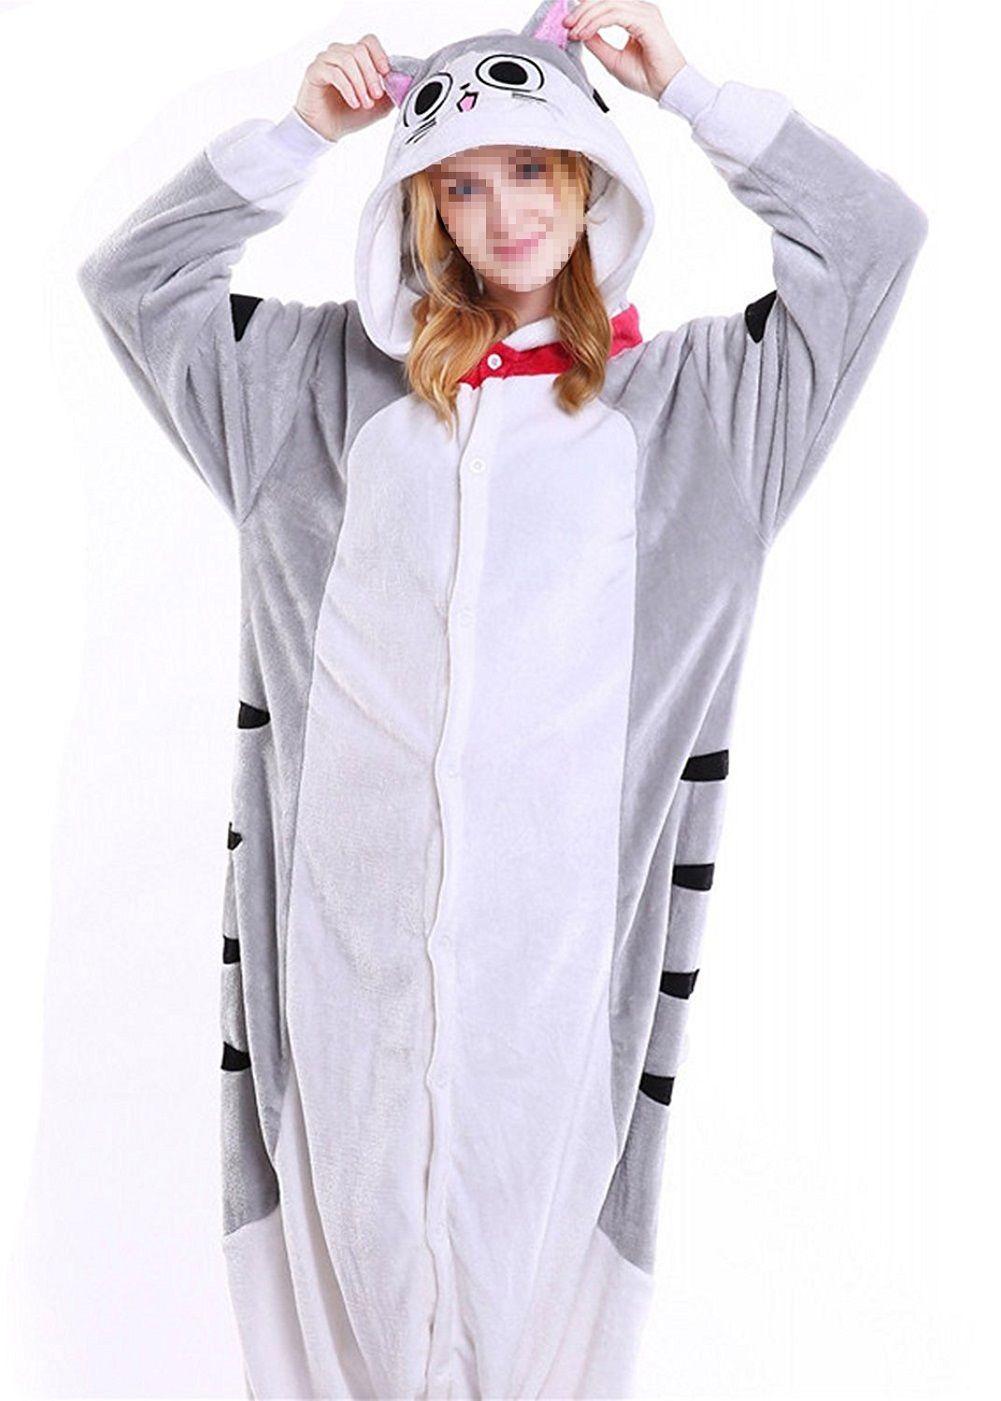 Unisex Adult Animal Cosplay Costume Pajamas Sleepwear Onesies Chi s ... 279eada57